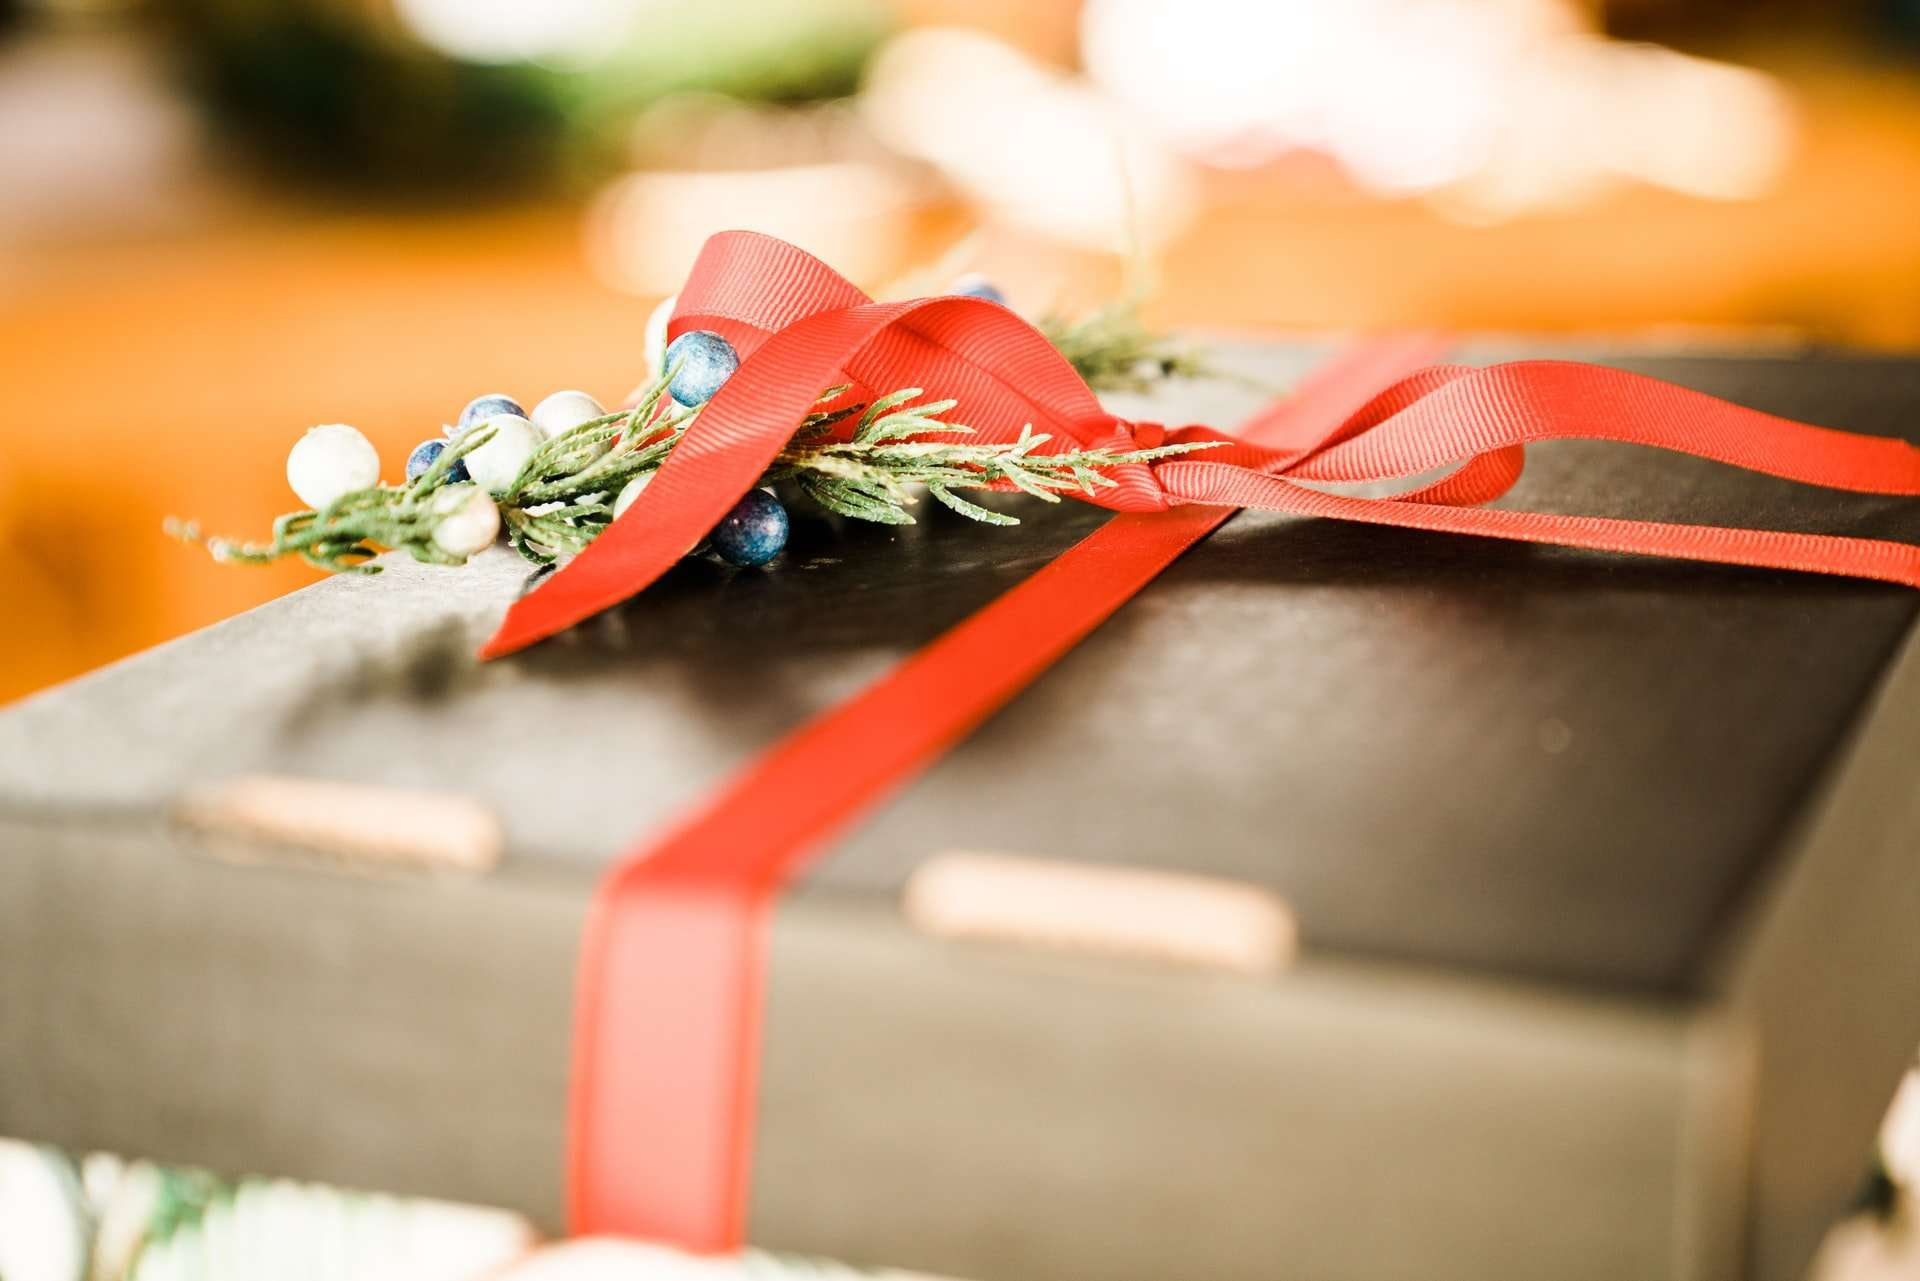 Nouvelles certifications Hubspot : c'est Noël avant l'heure chez MyDigiCompany !